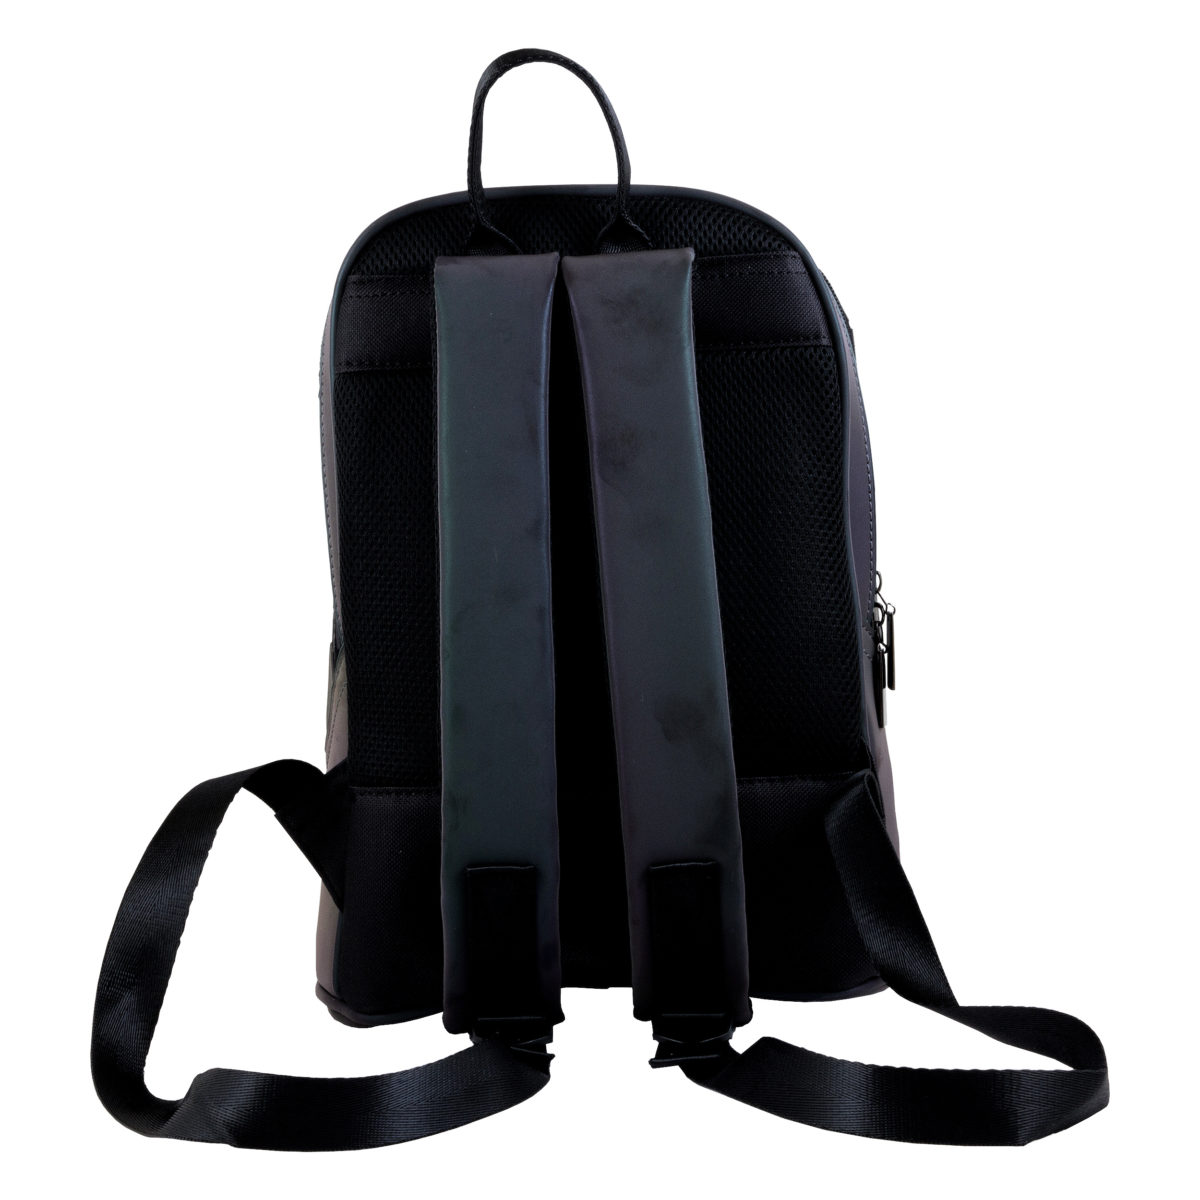 Рюкзак хамелеон из кусочков Bao Bao оптом